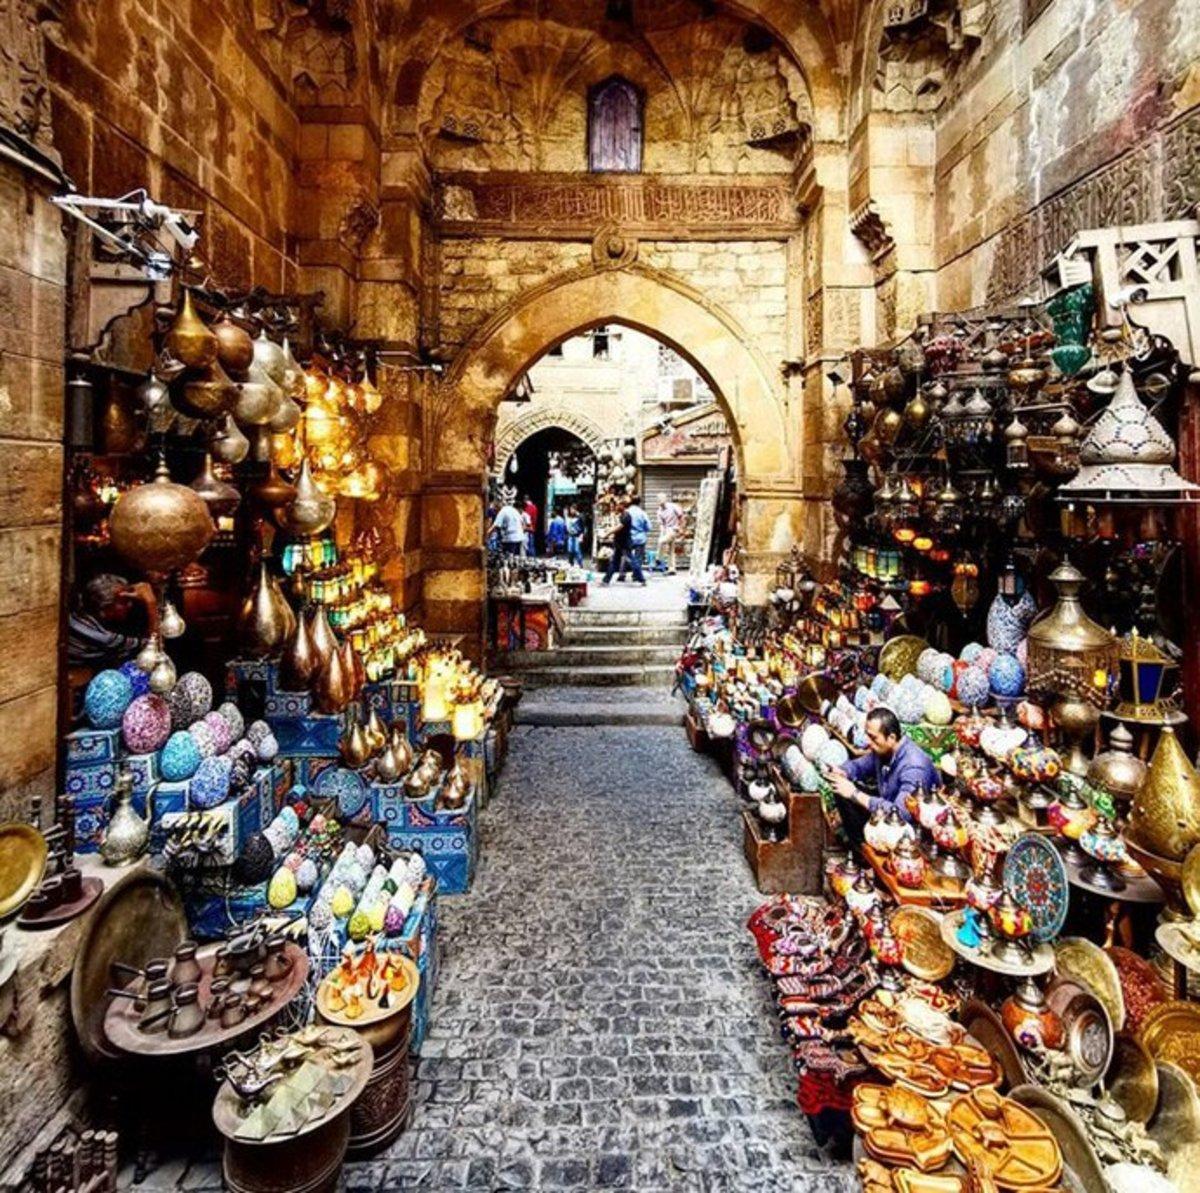 Bab al-Ghuri, Khan el-Khalili Bazaar, Cairo, Egypt.